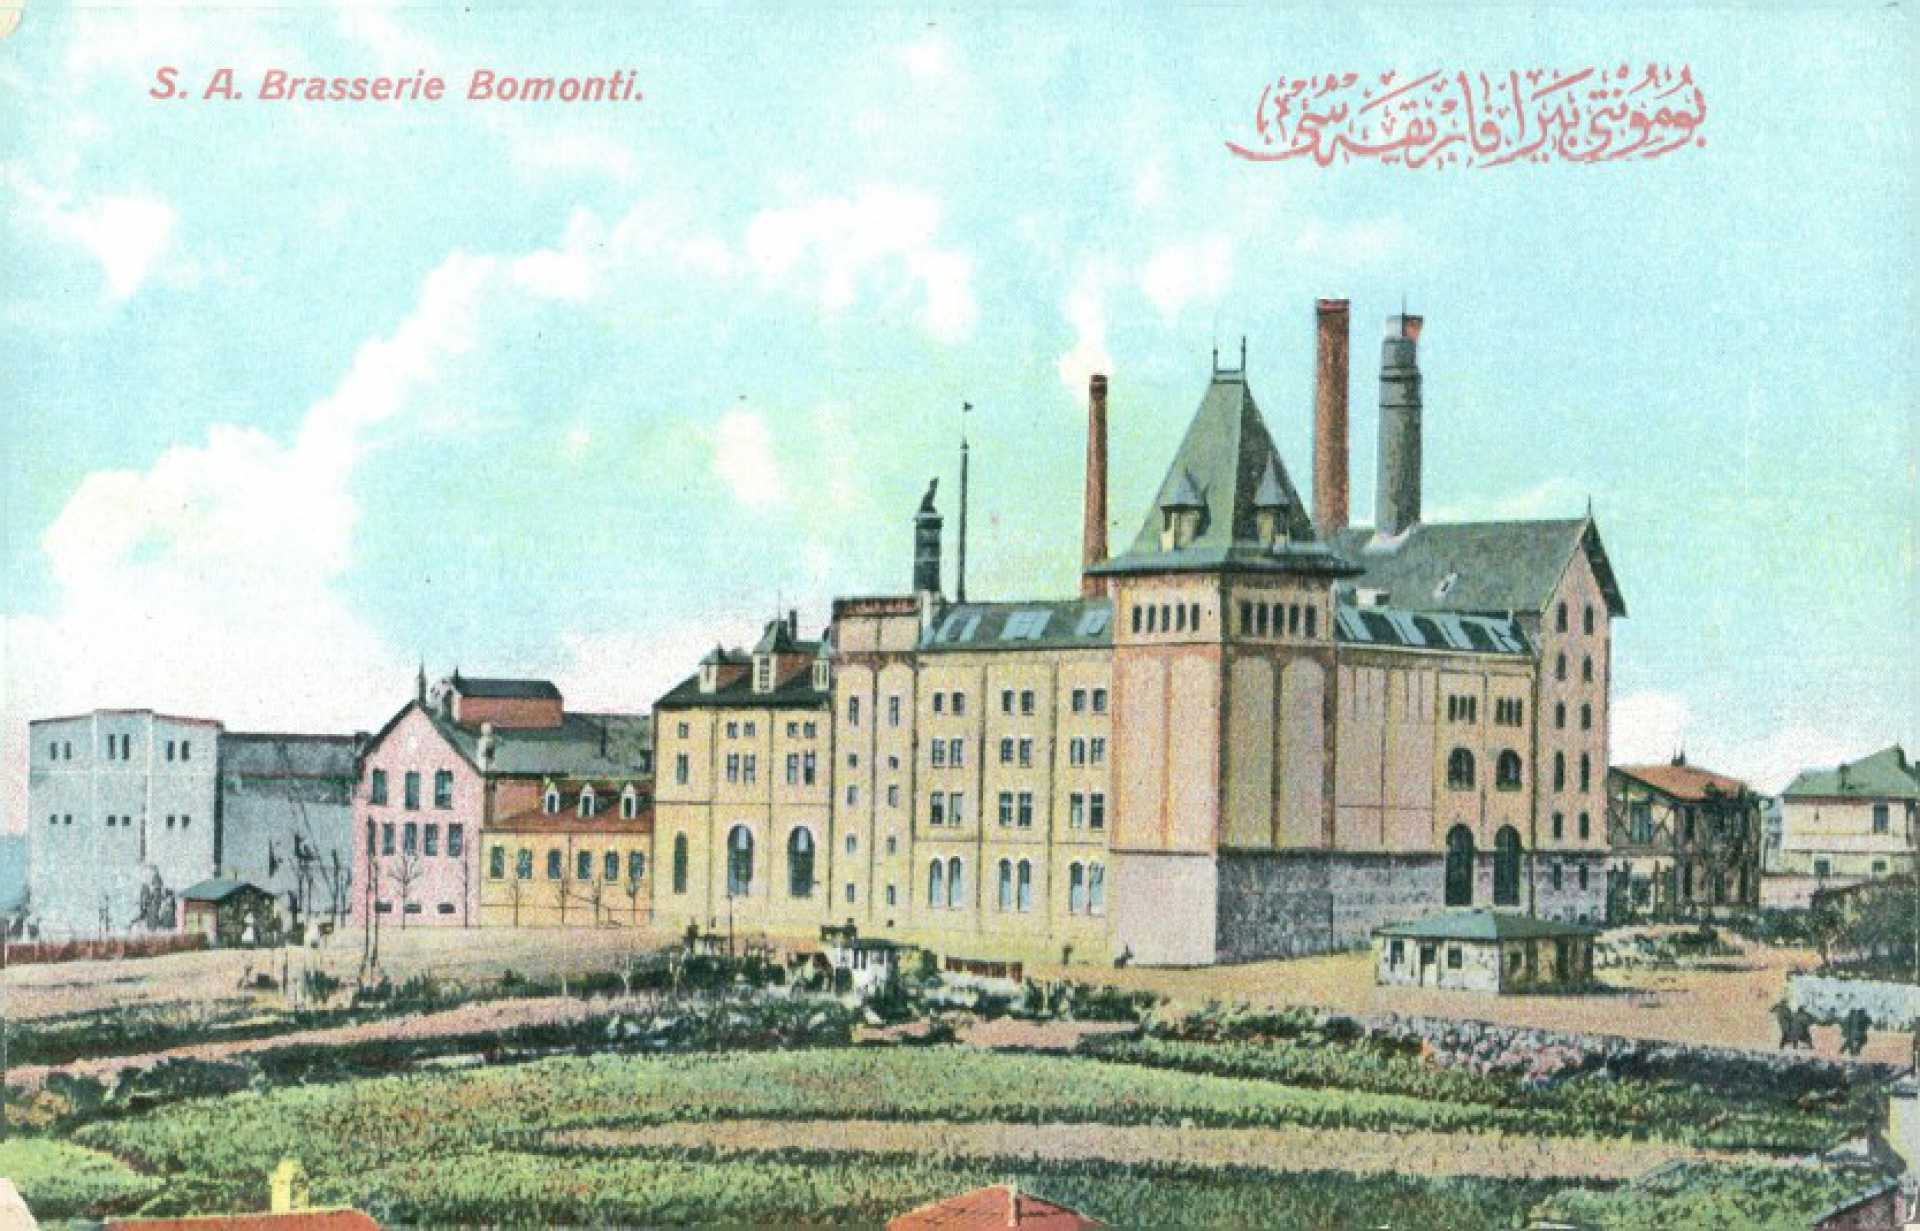 S. A. Brasserie Bomonti